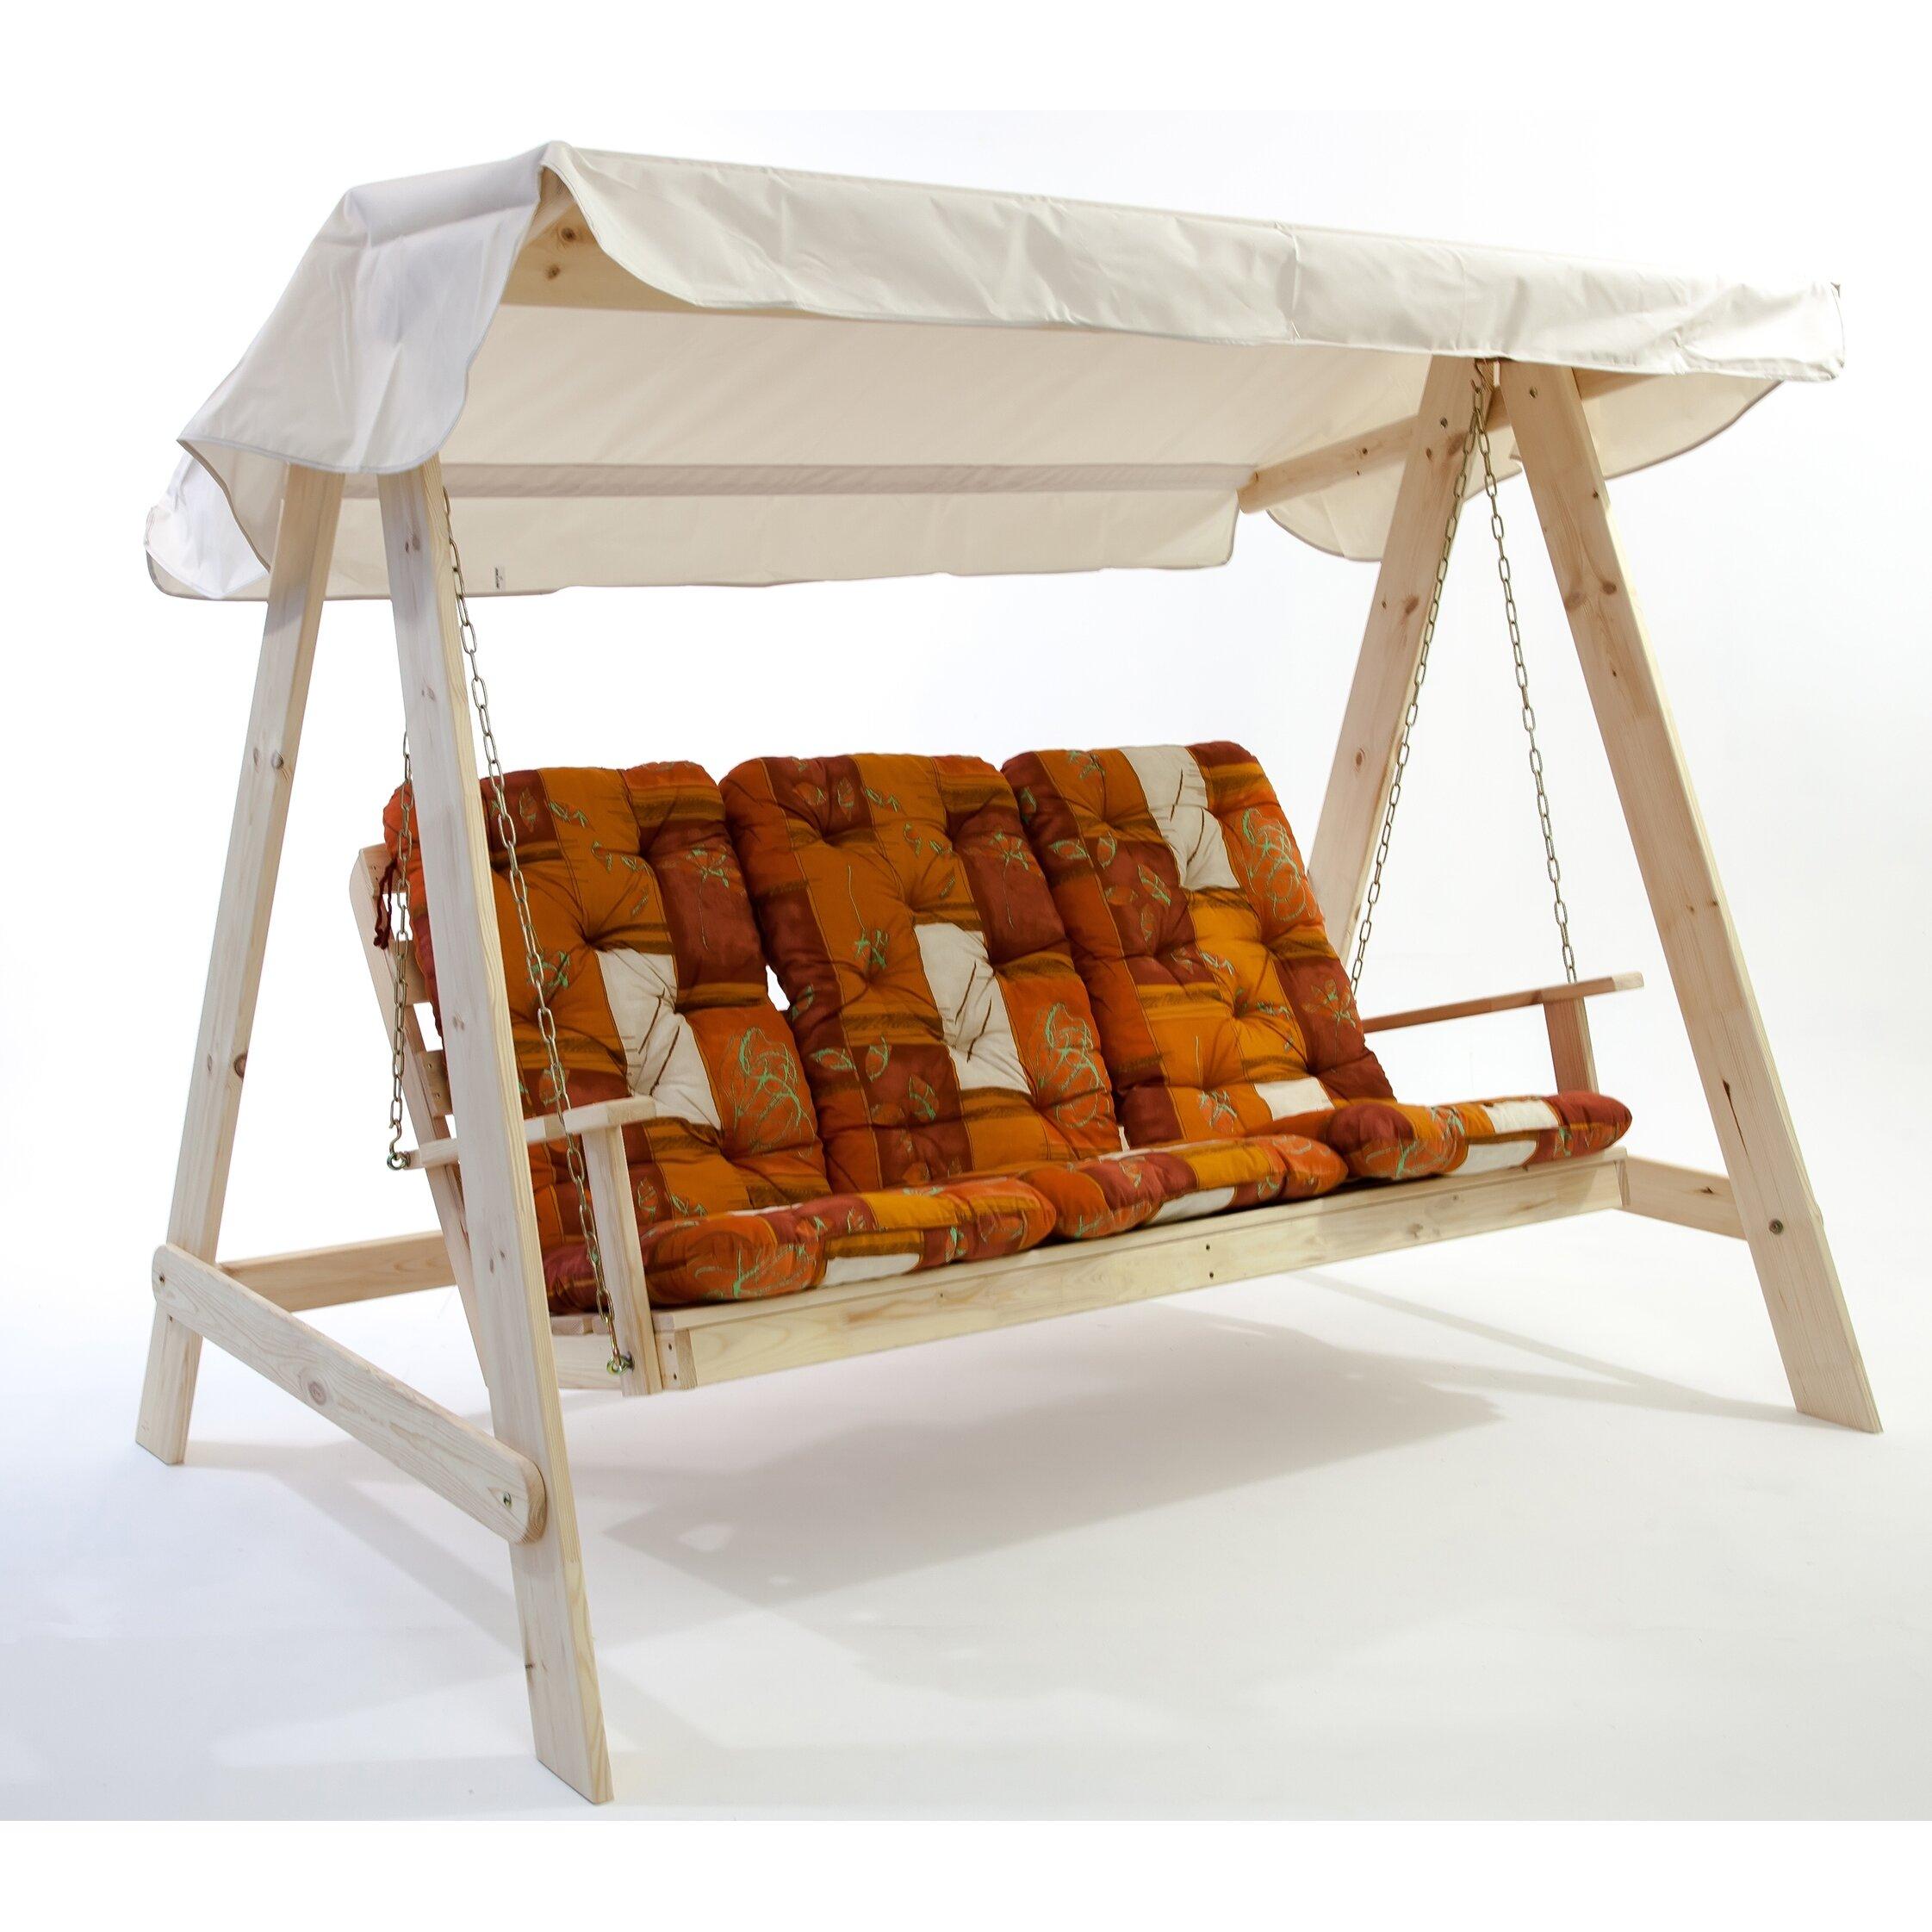 hollywoodschaukel vetlanda mit auflage von caracella. Black Bedroom Furniture Sets. Home Design Ideas